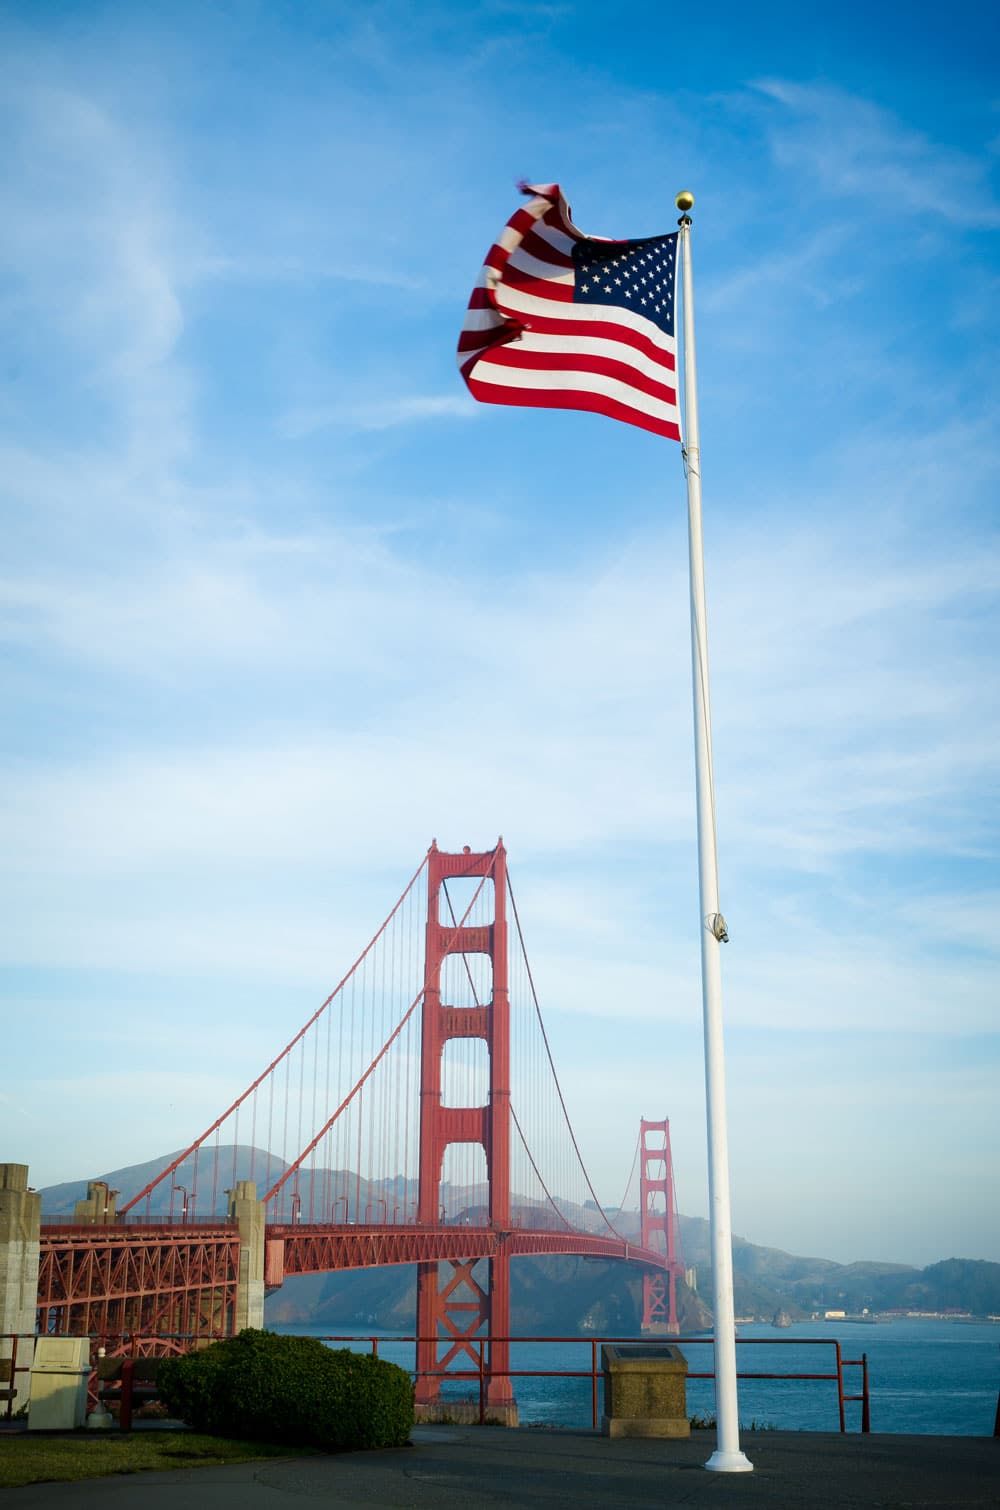 Golden Gate Bridge in San Francisco California and US flag.